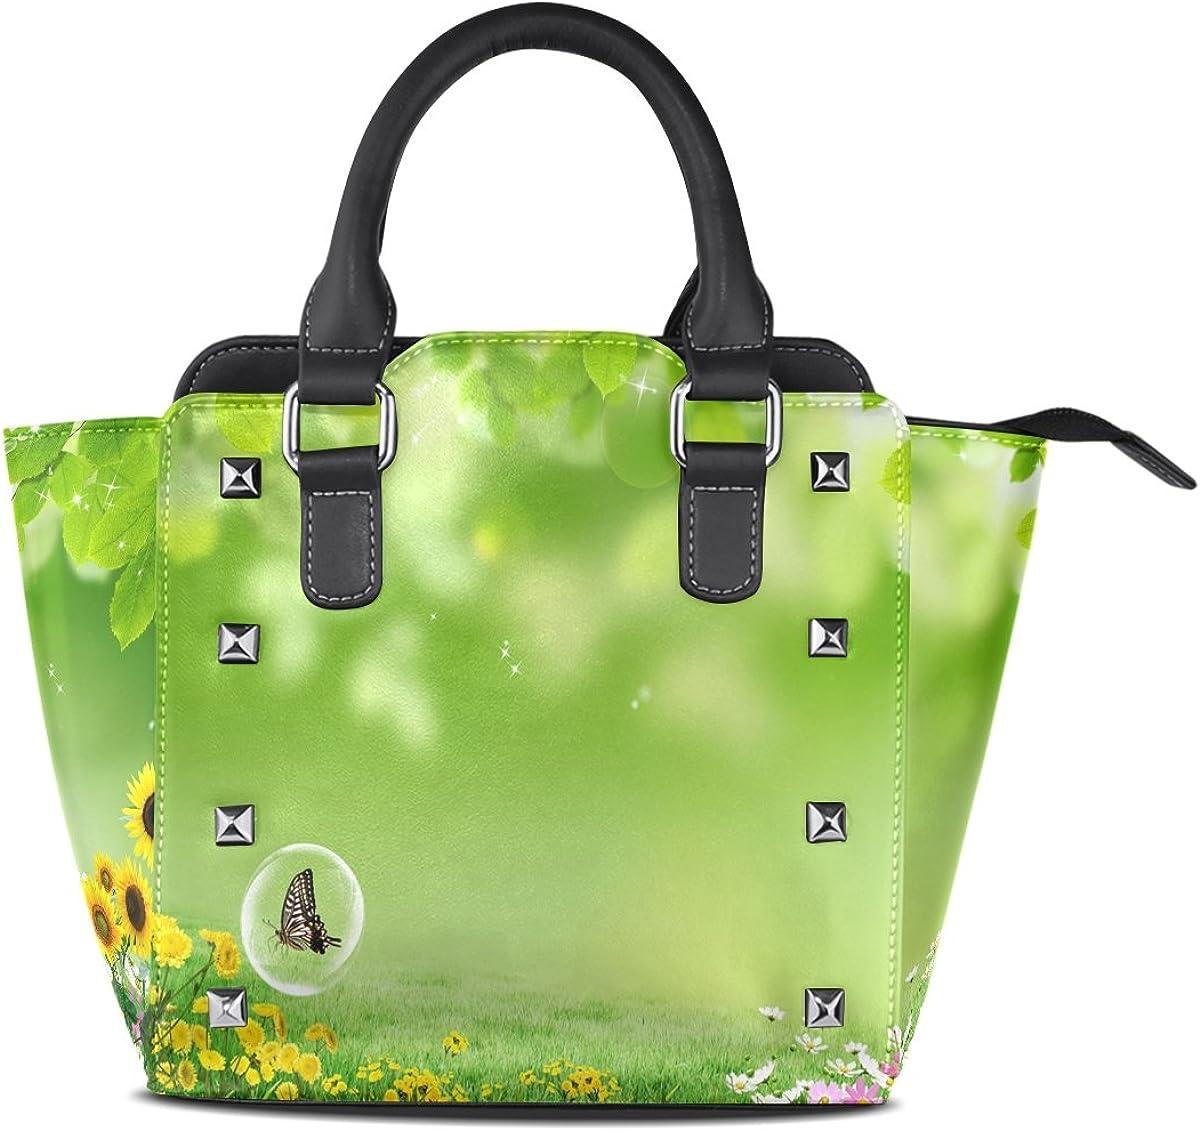 Jennifer Butterfly Flowers Spring Landscape PU Leather Top-Handle Handbags Single-Shoulder Tote Crossbody Bag Messenger Bags For Women